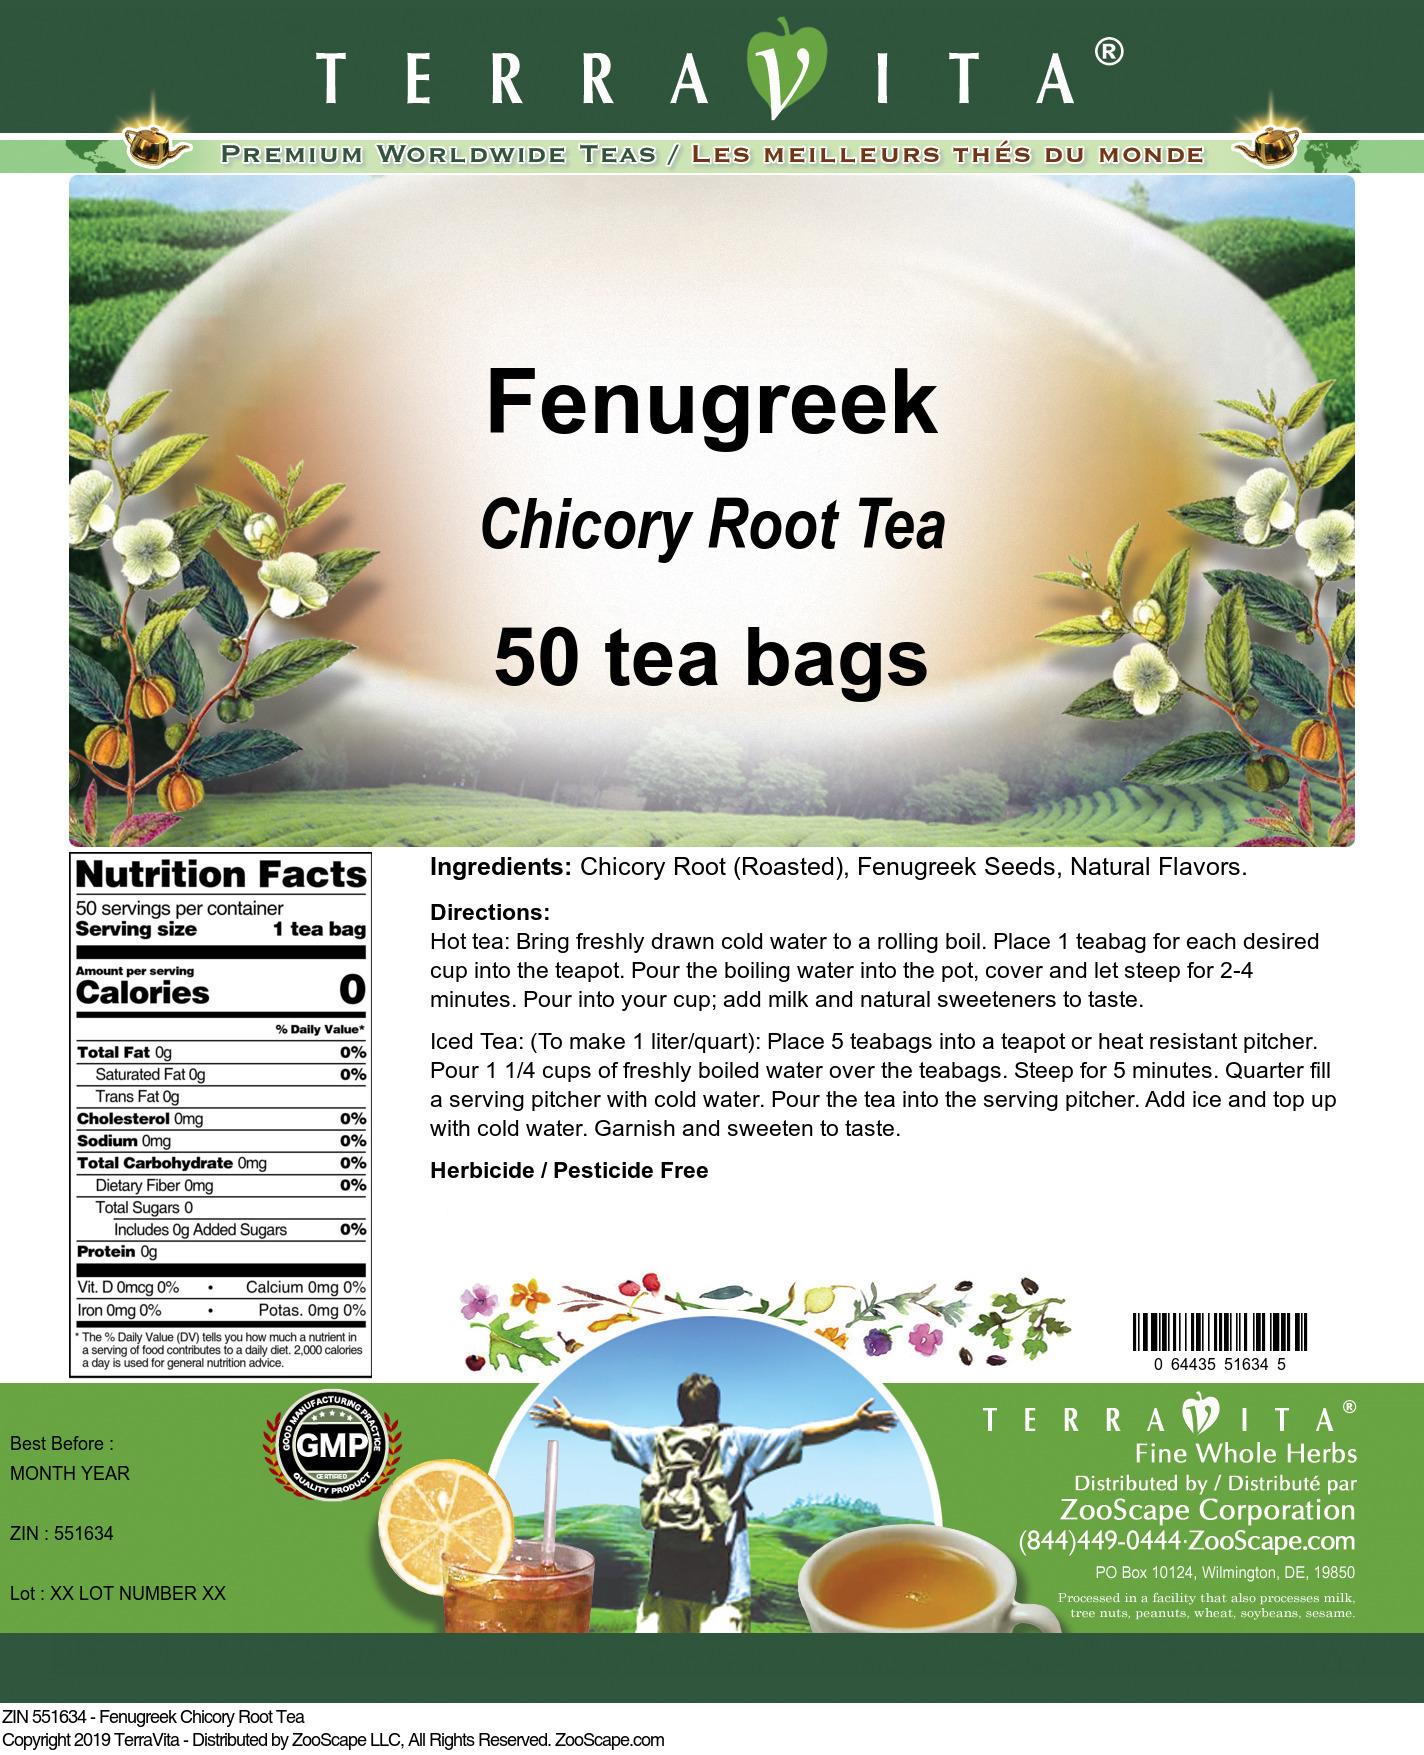 Fenugreek Chicory Root